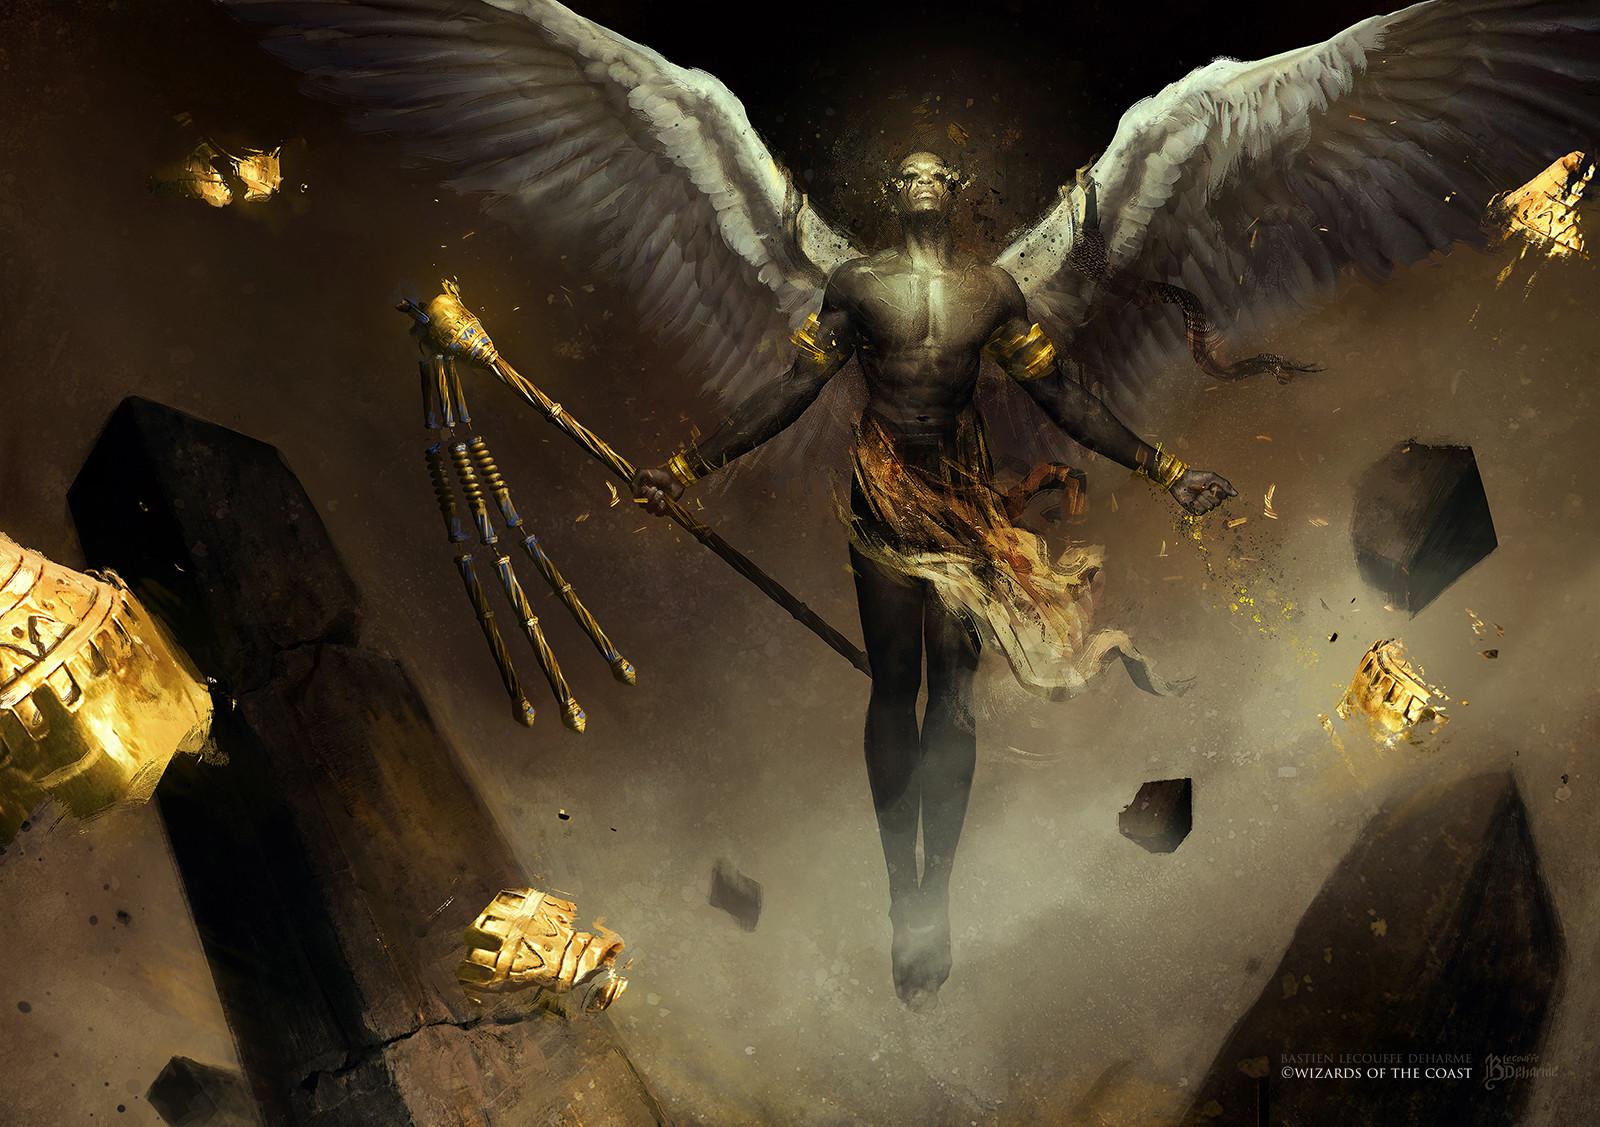 Bastien lecouffe deharme desolation angel web